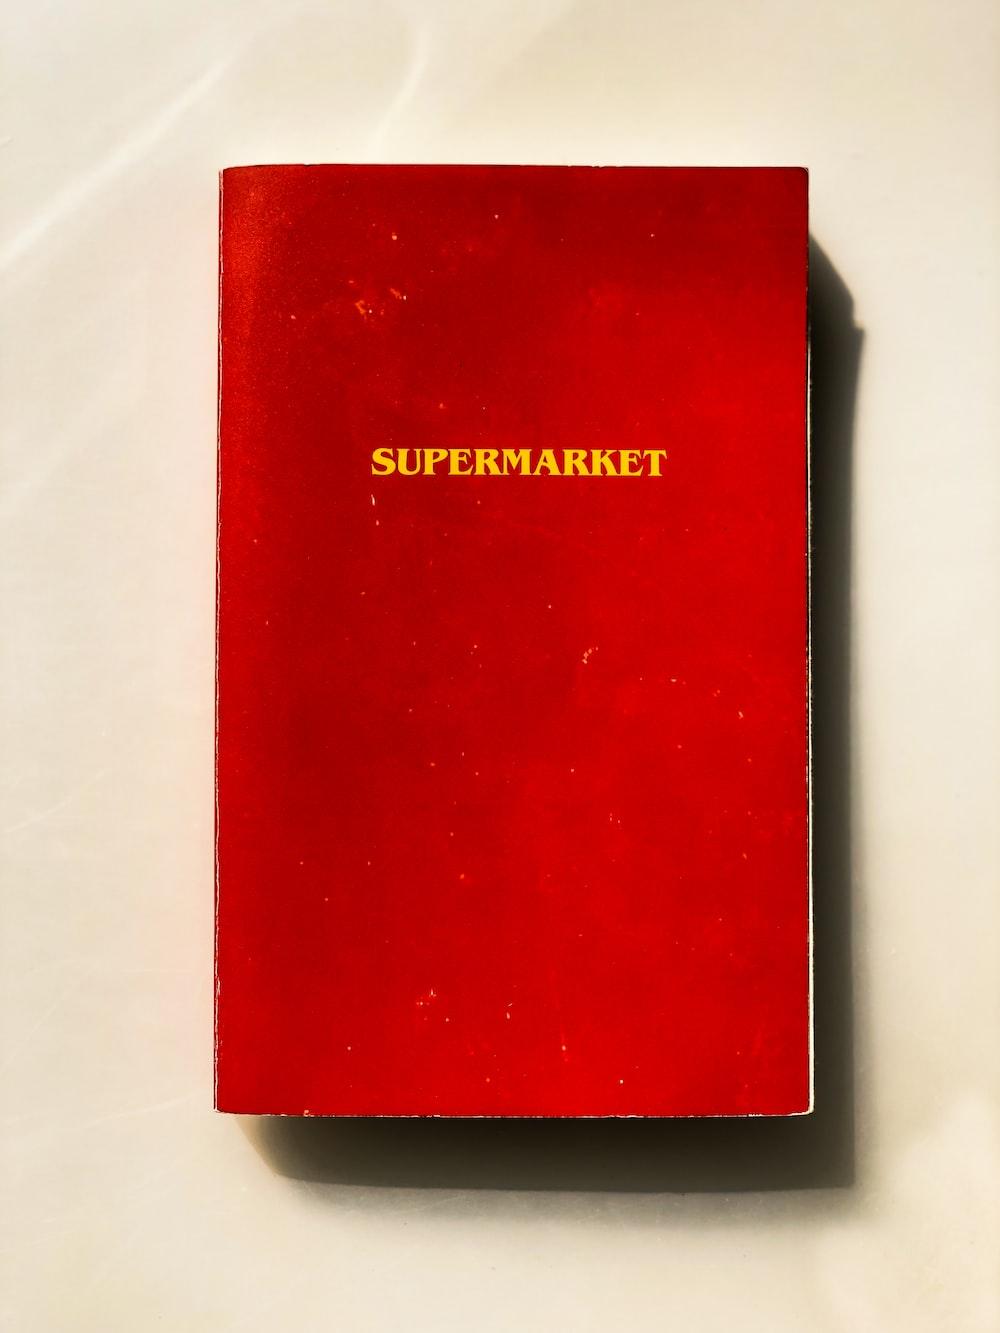 Supermatket book